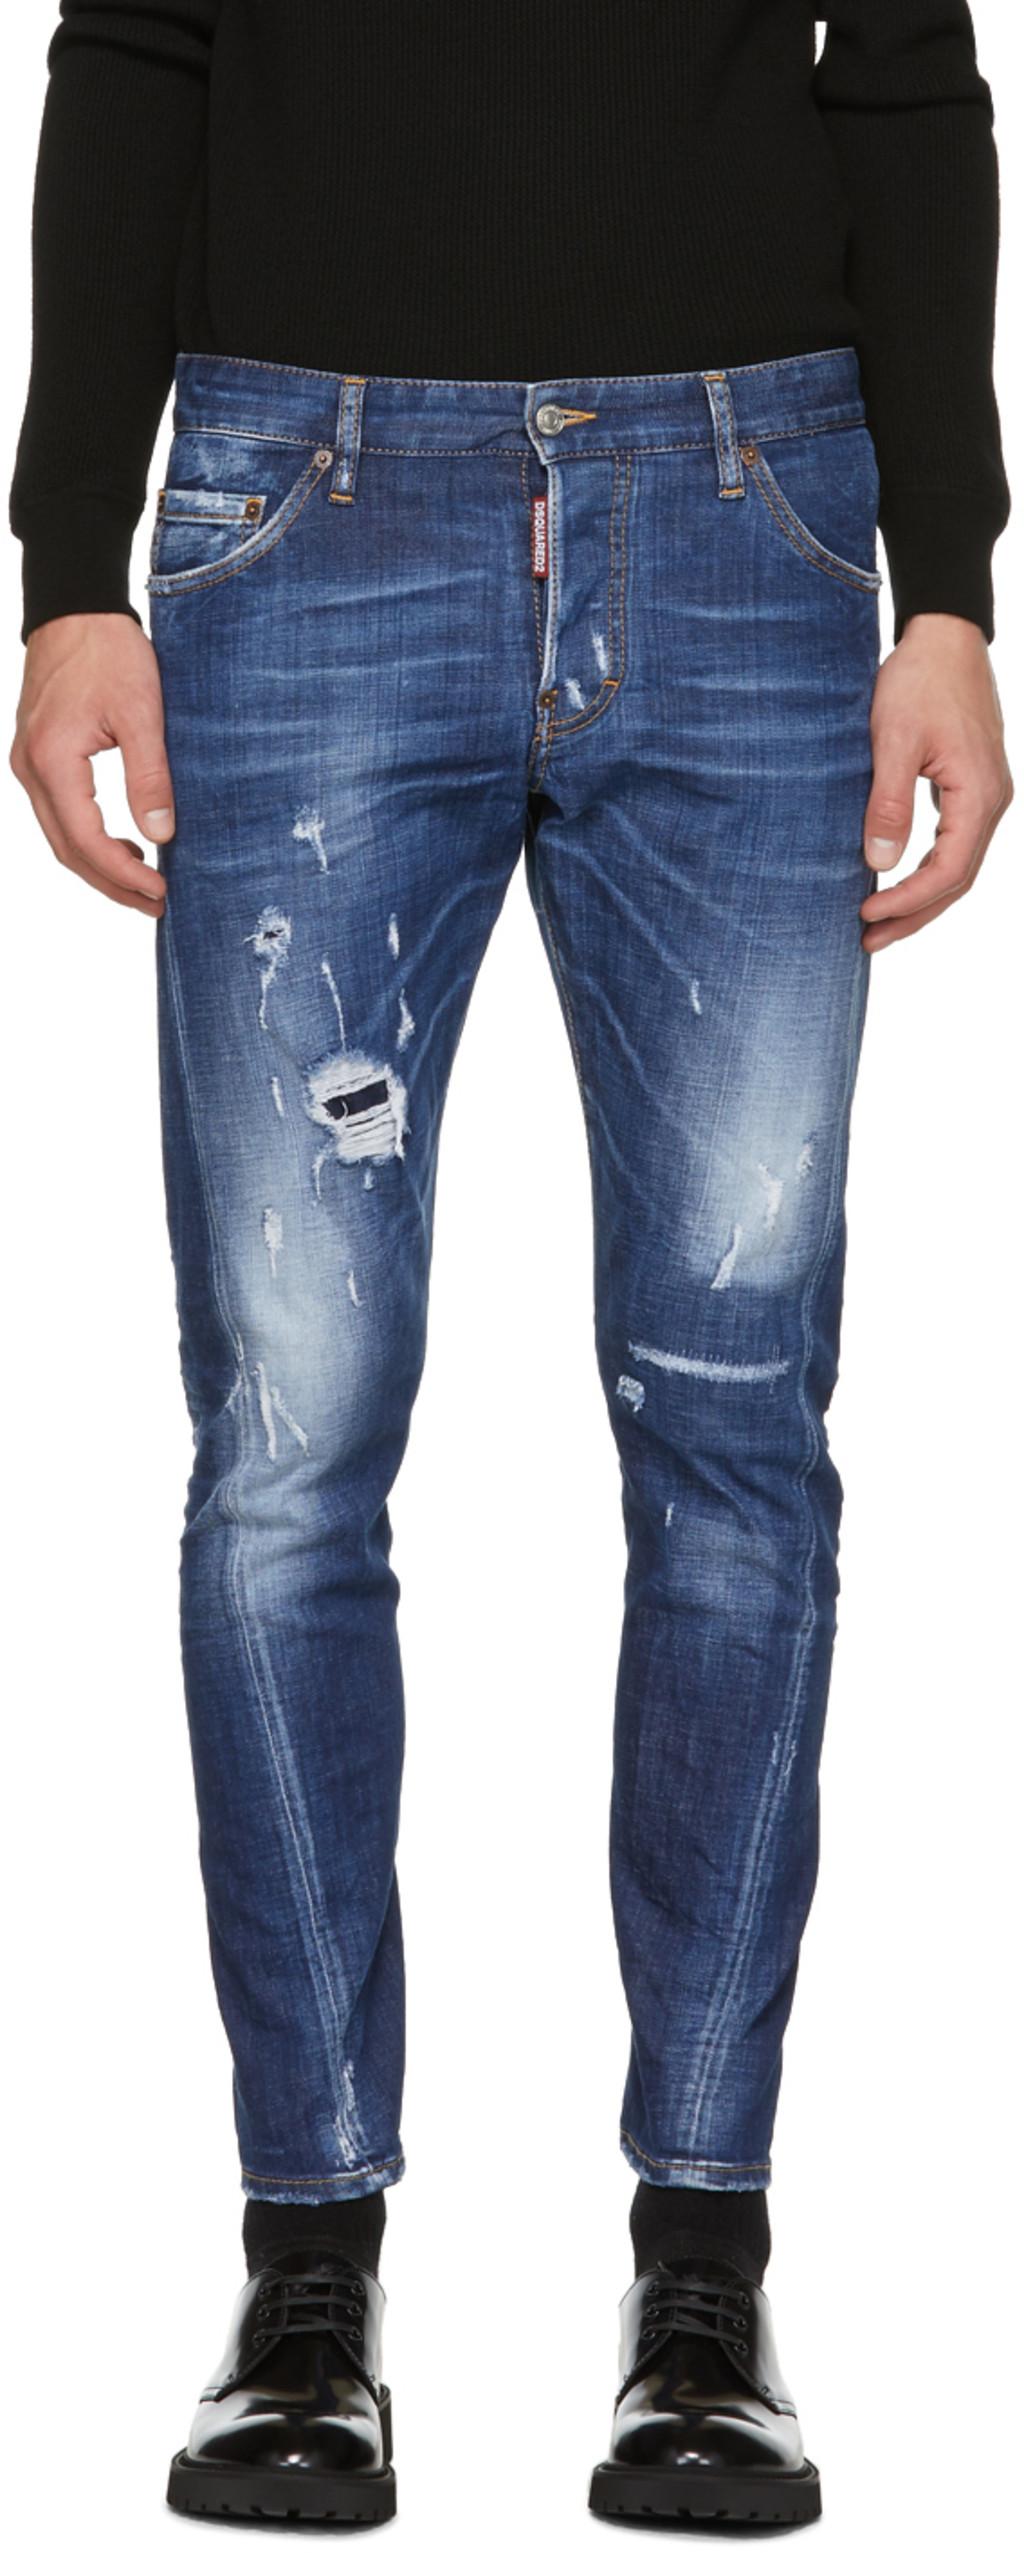 Dsquared2 Jeans For Men Ssense Canada